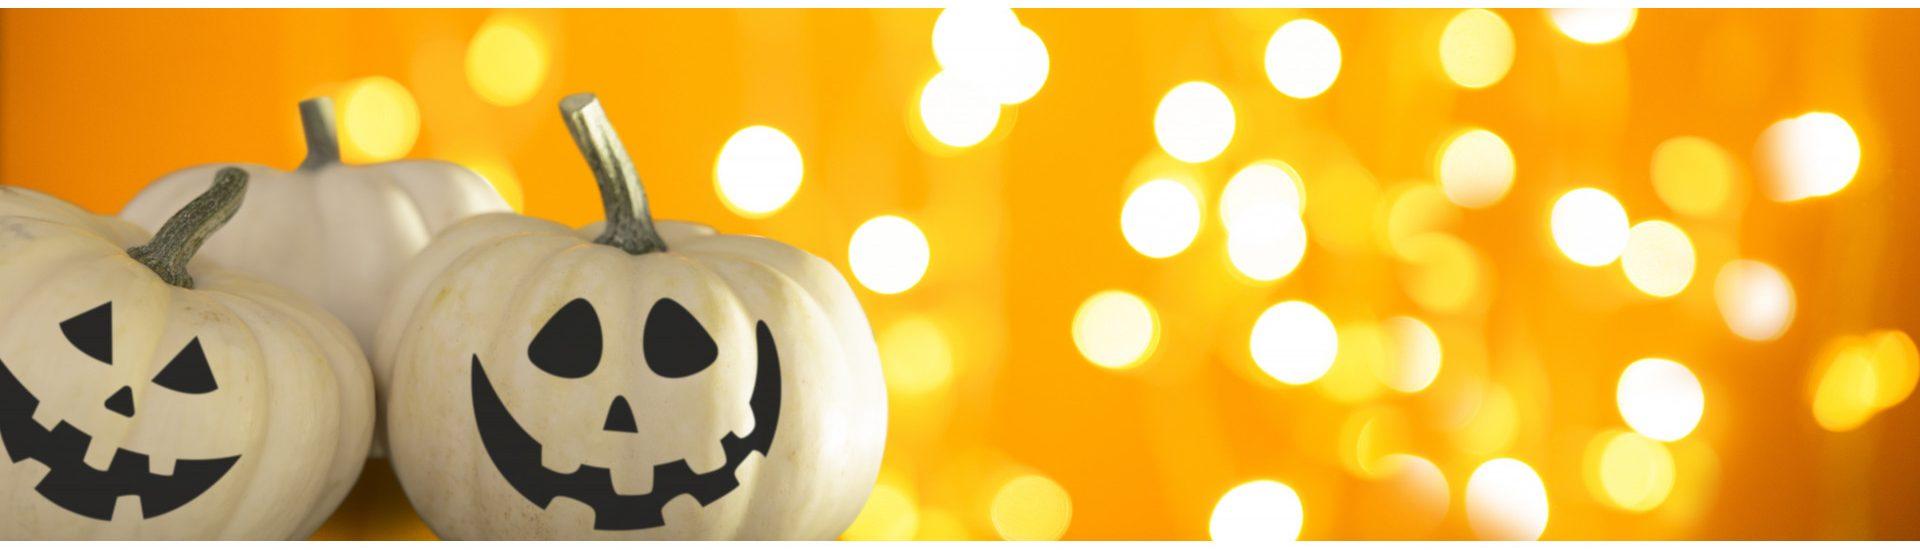 Iluminación para Halloween: todo lo que necesitas saber